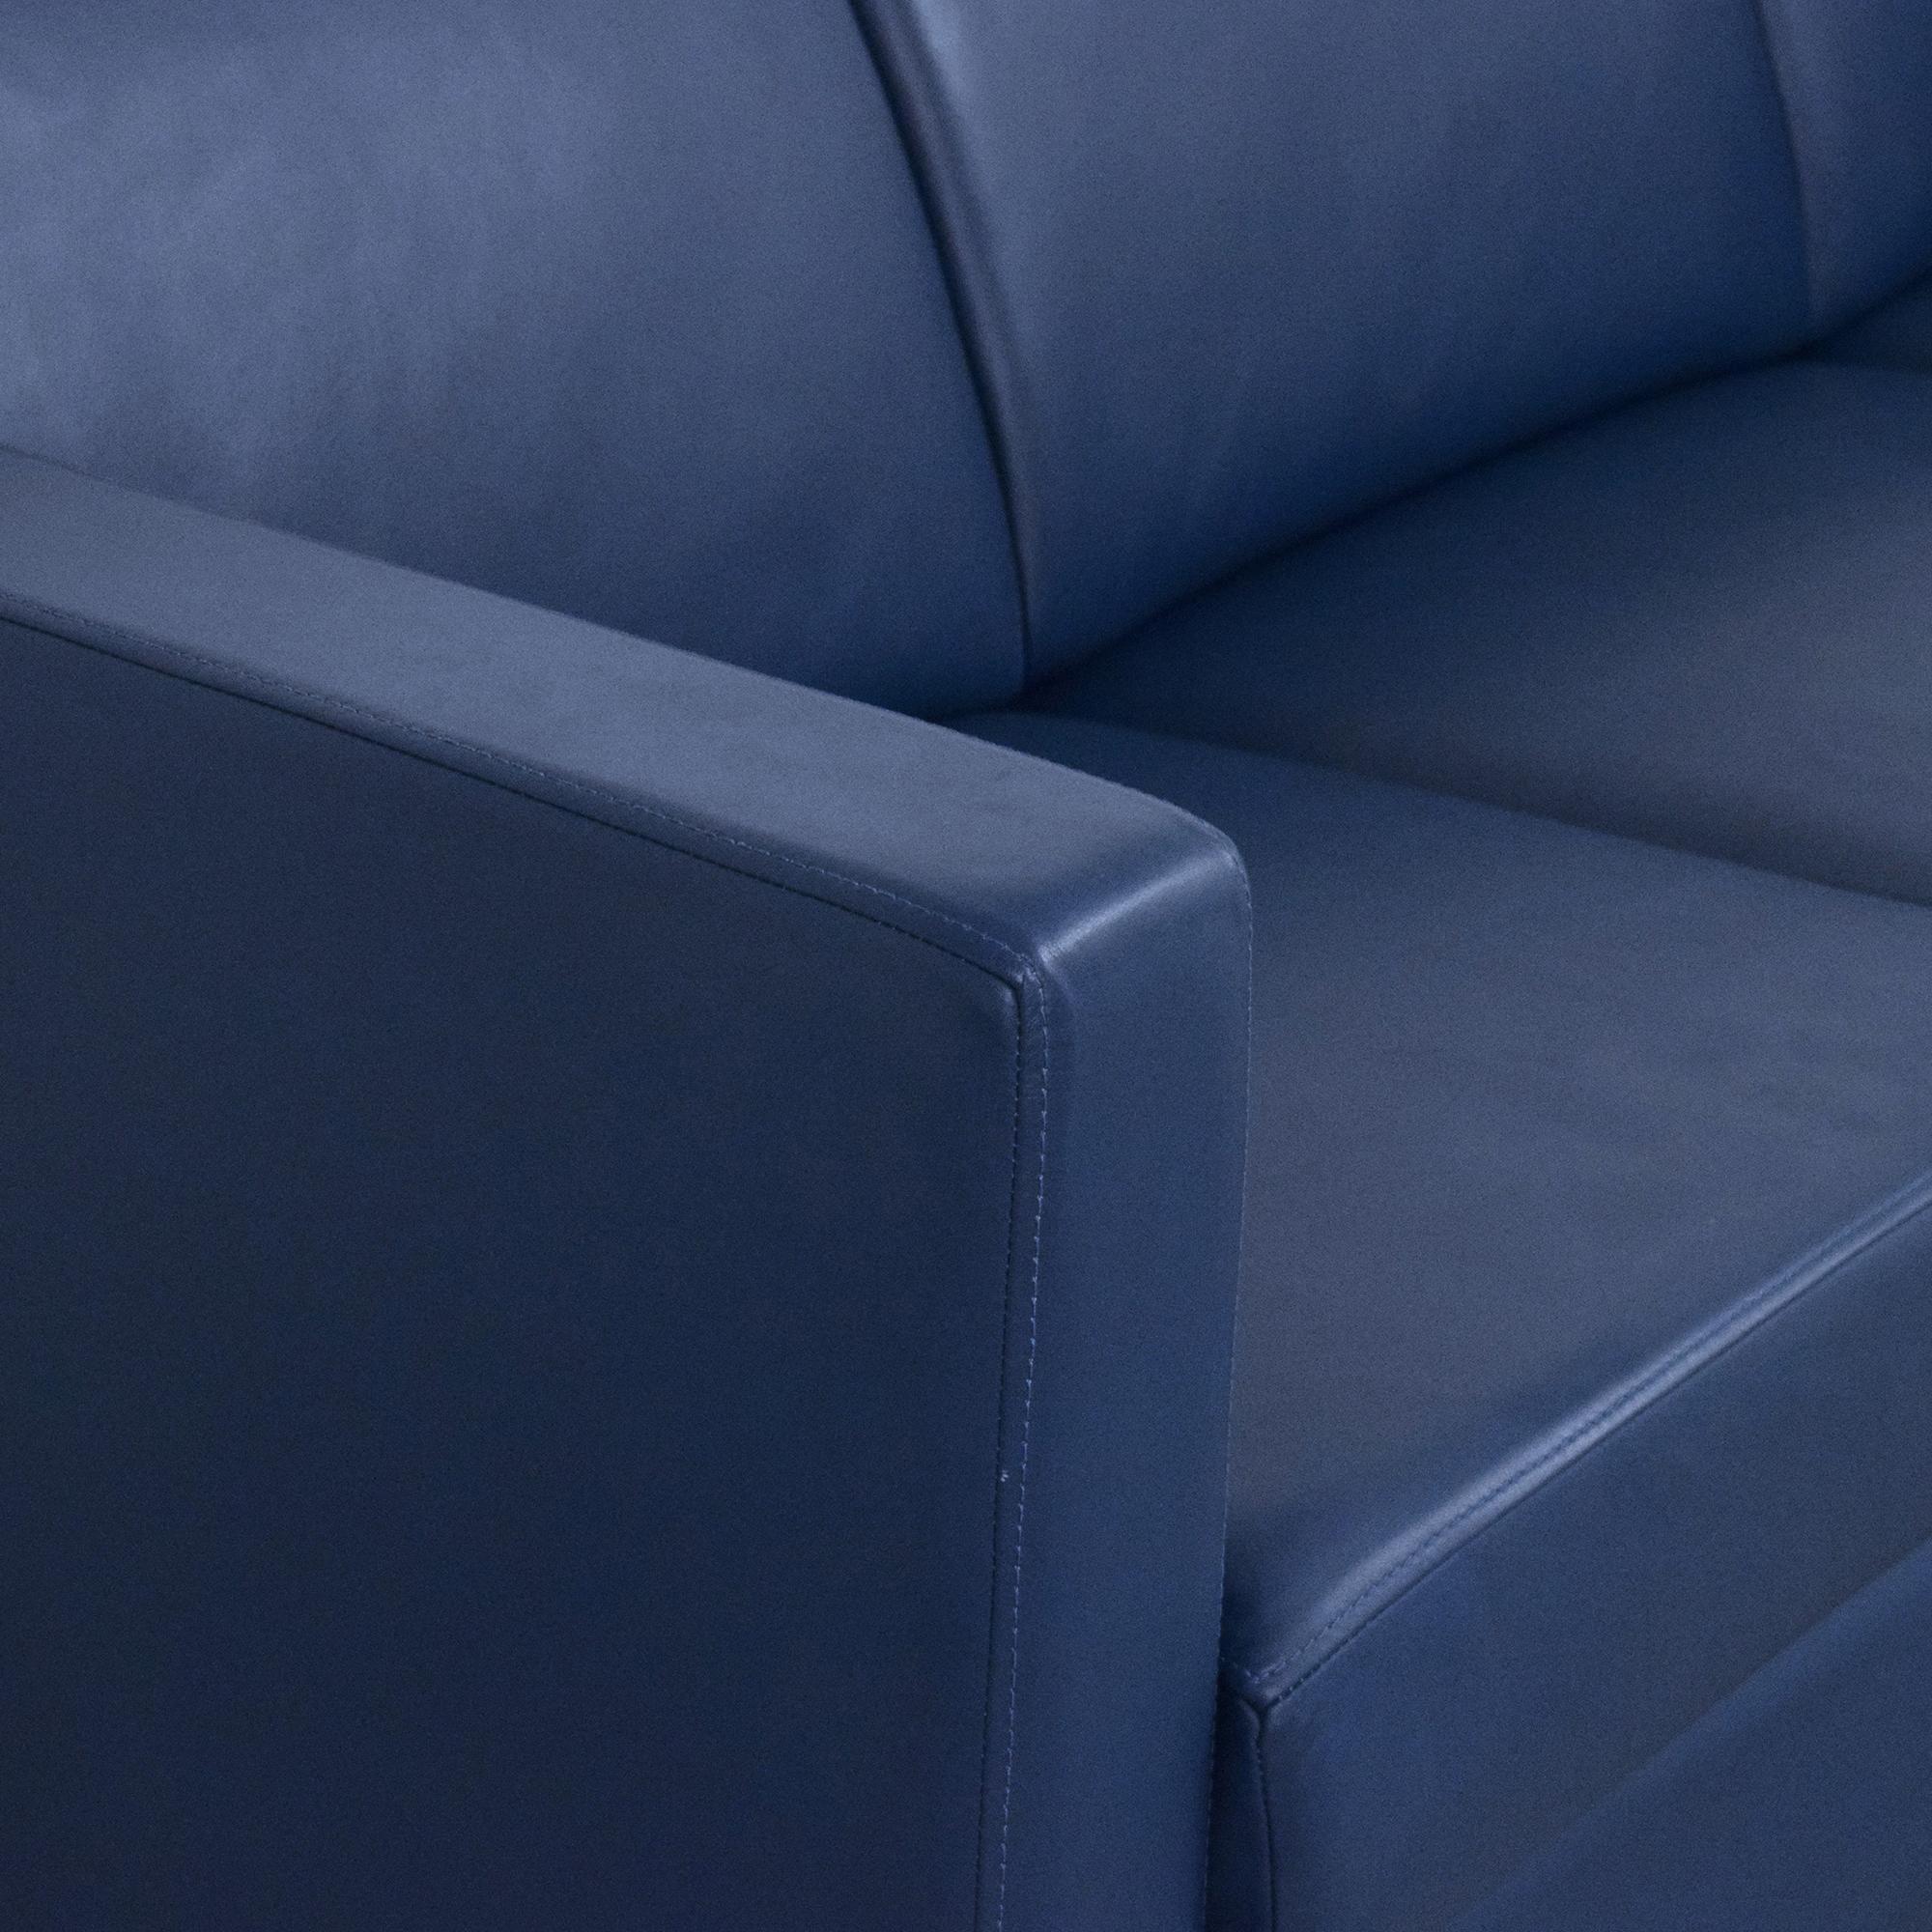 Krug Krug Sloane Sofa Sofas